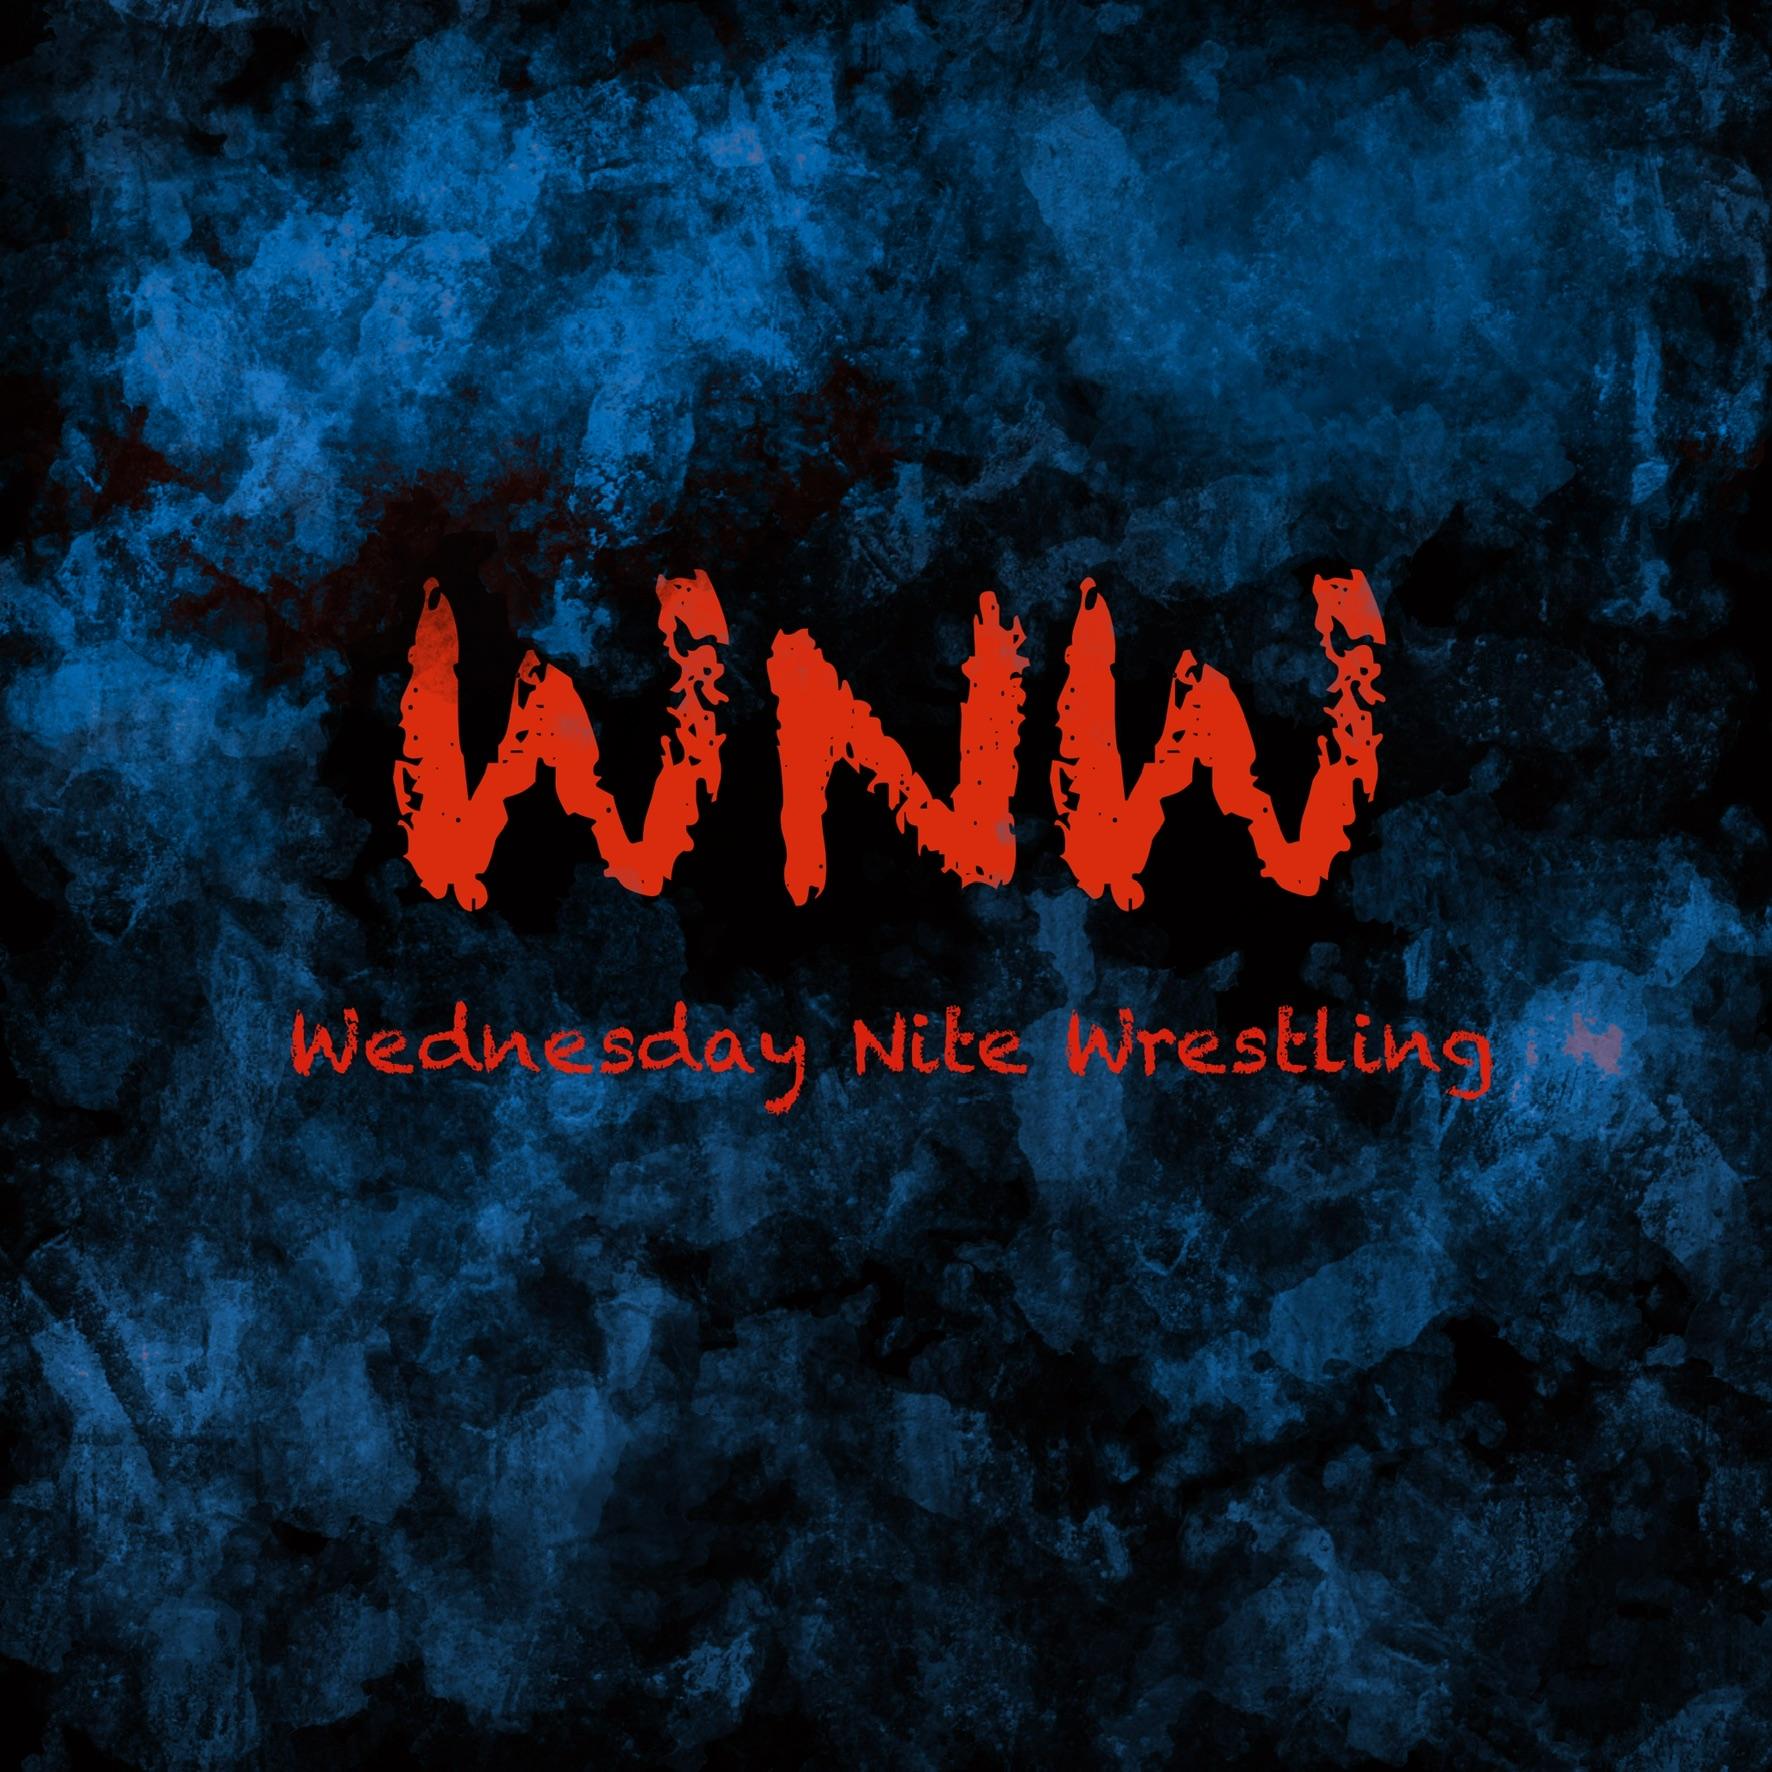 Wednesday Nite Wrestling